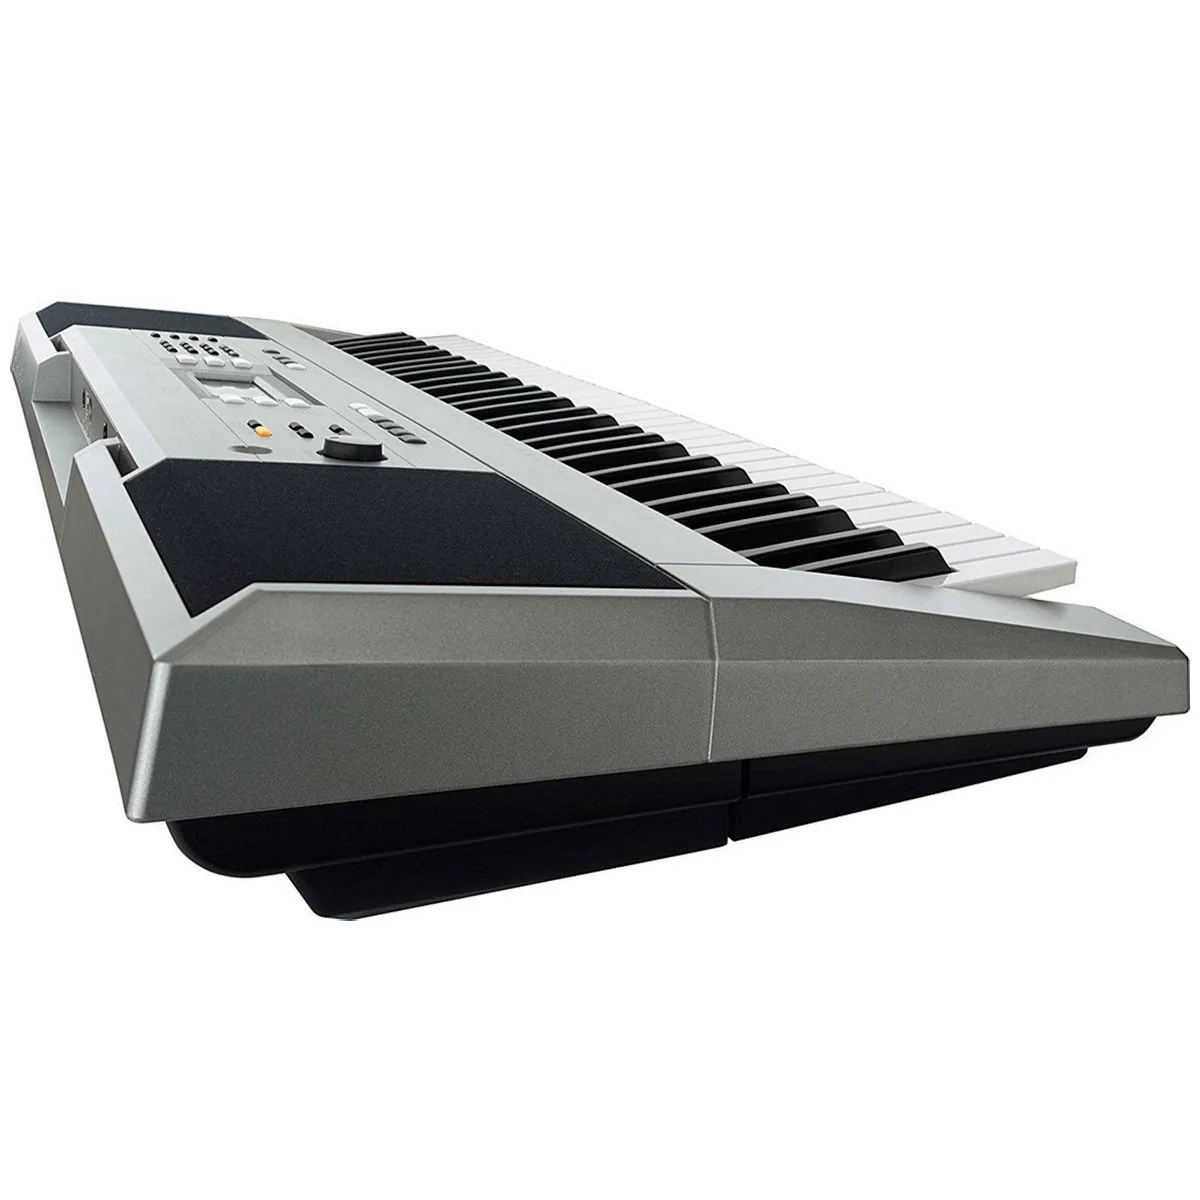 Teclado Arranjador Yamaha PSR E353 USB 61 Teclas